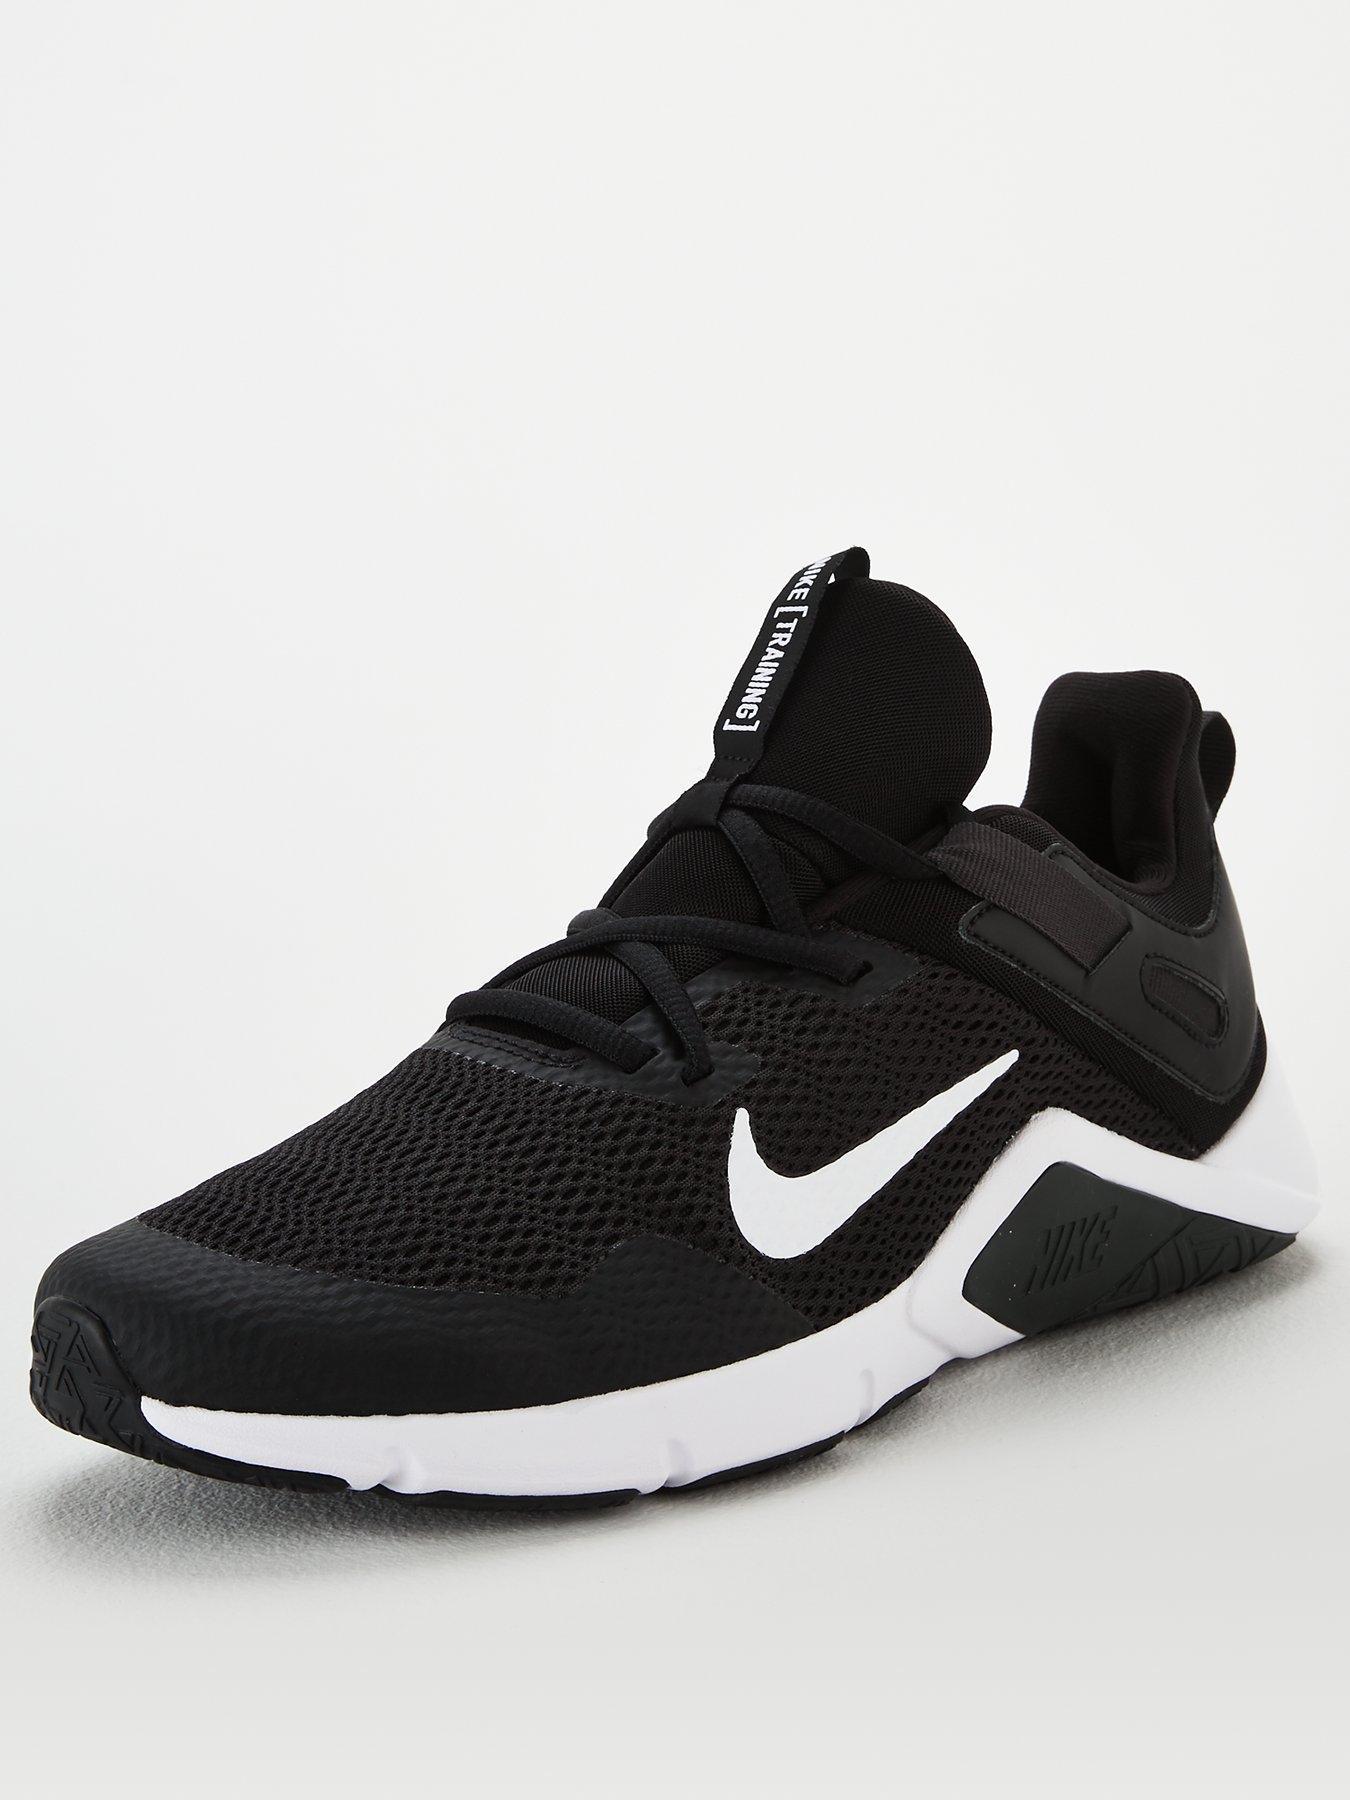 Nike Mens Trainers | Nike Trainers